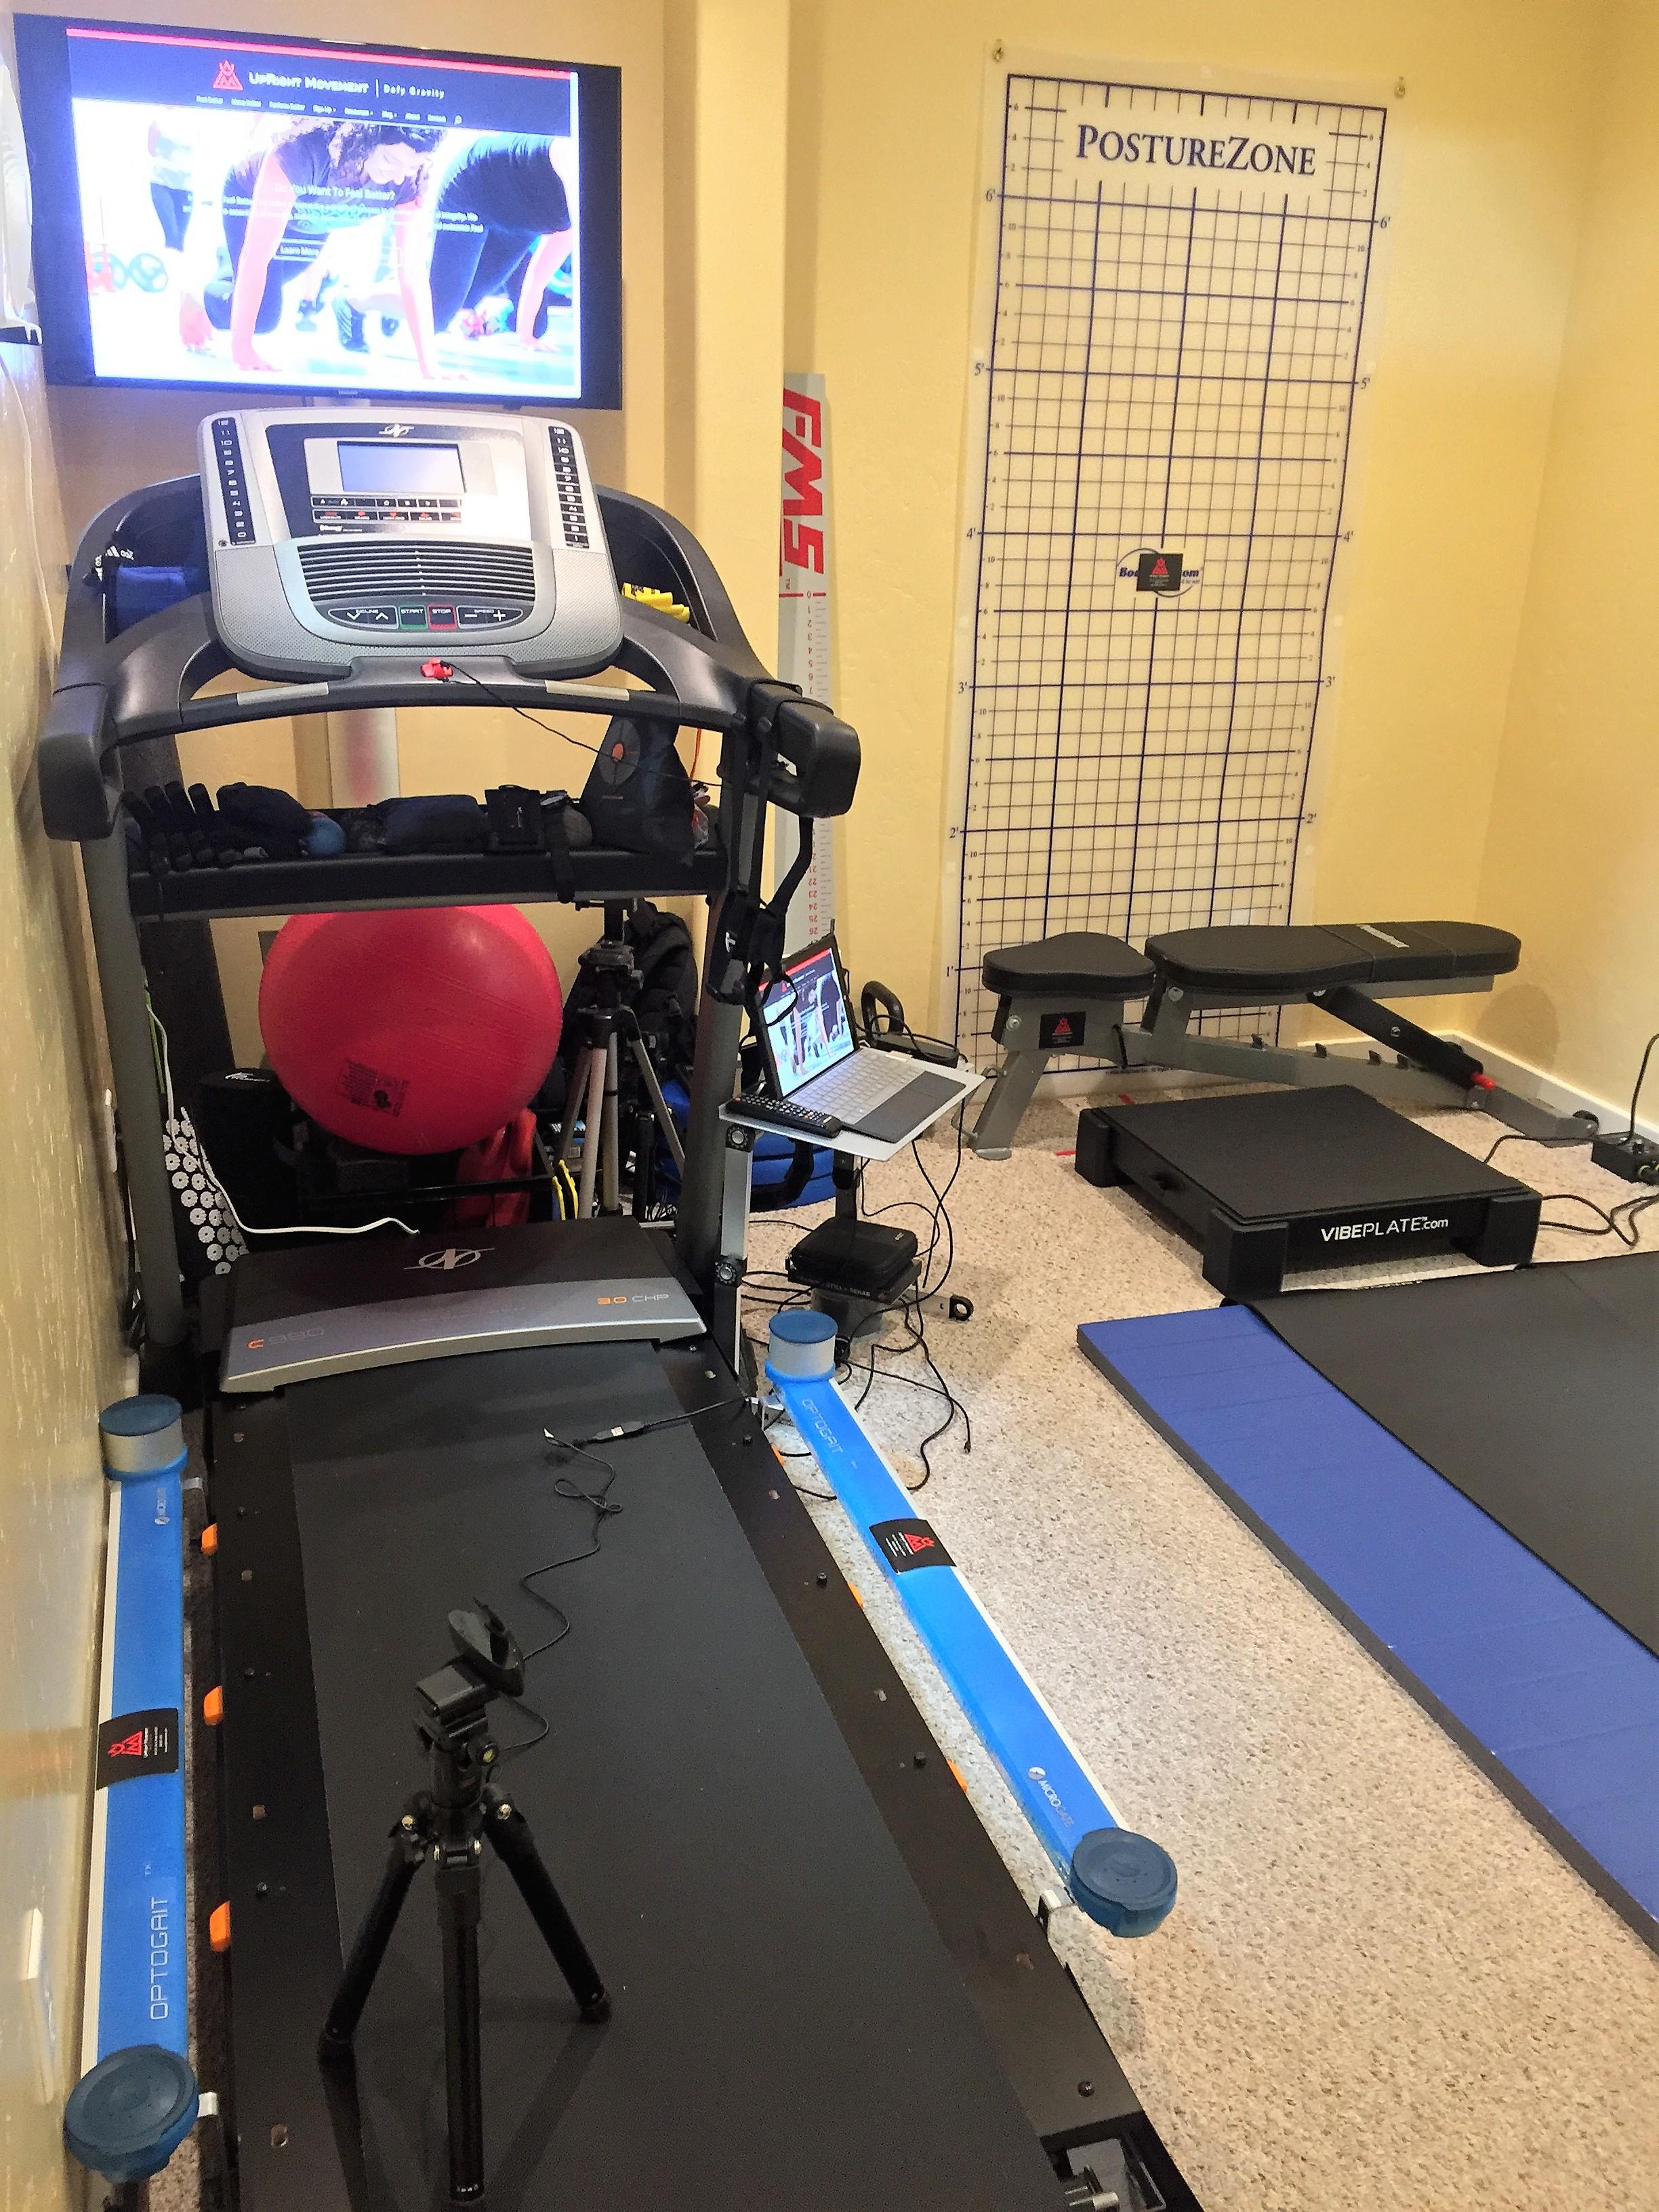 Movement Signature Room: Feel Better Move Better Perform Better